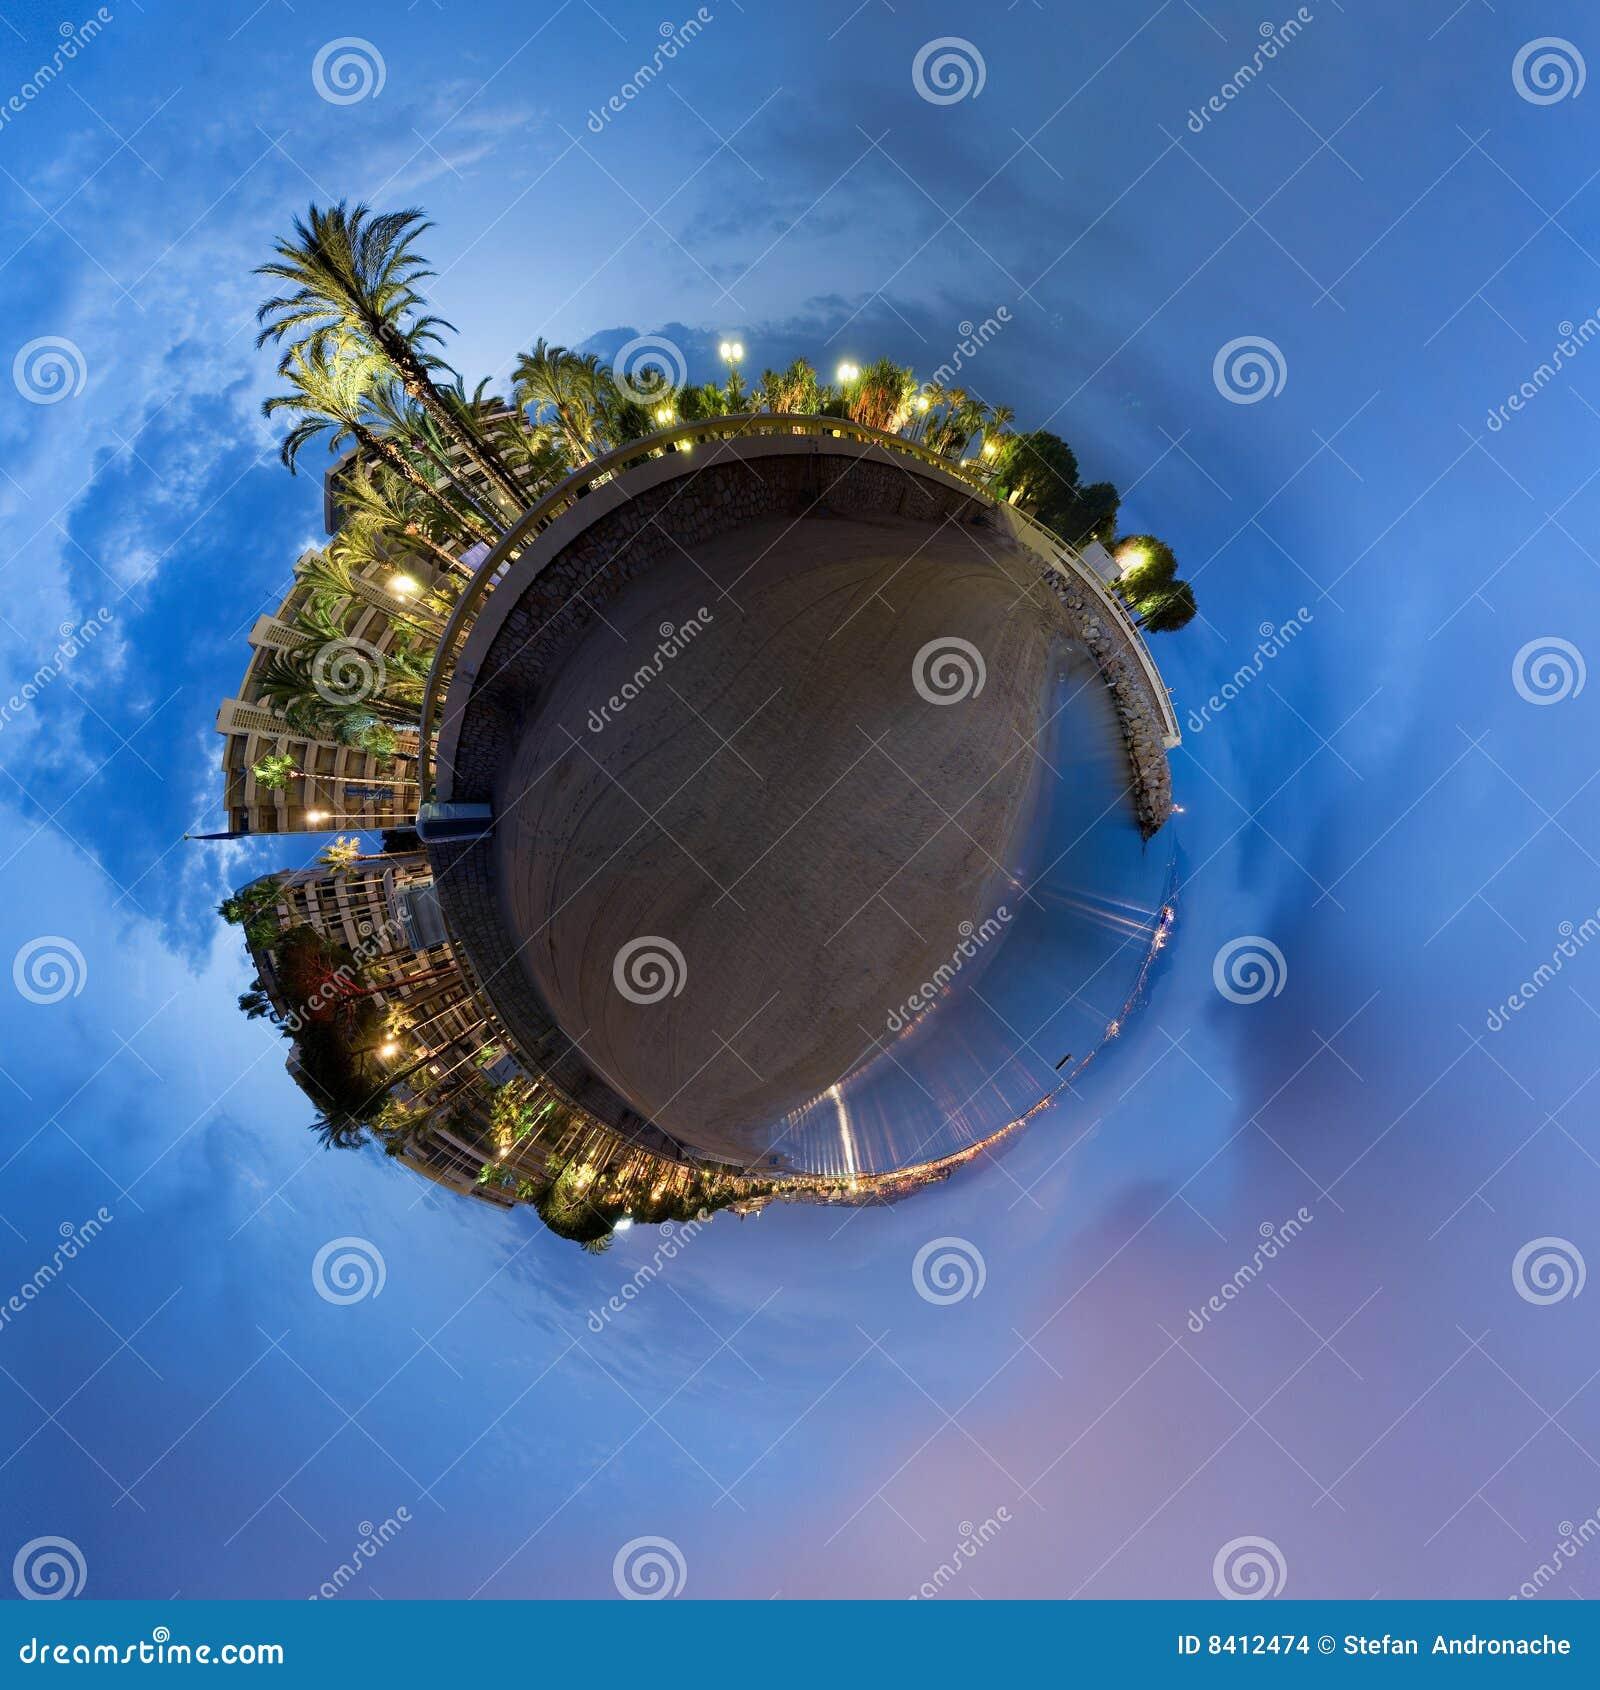 cannes france stock photo image of tourism seaside 8412474. Black Bedroom Furniture Sets. Home Design Ideas